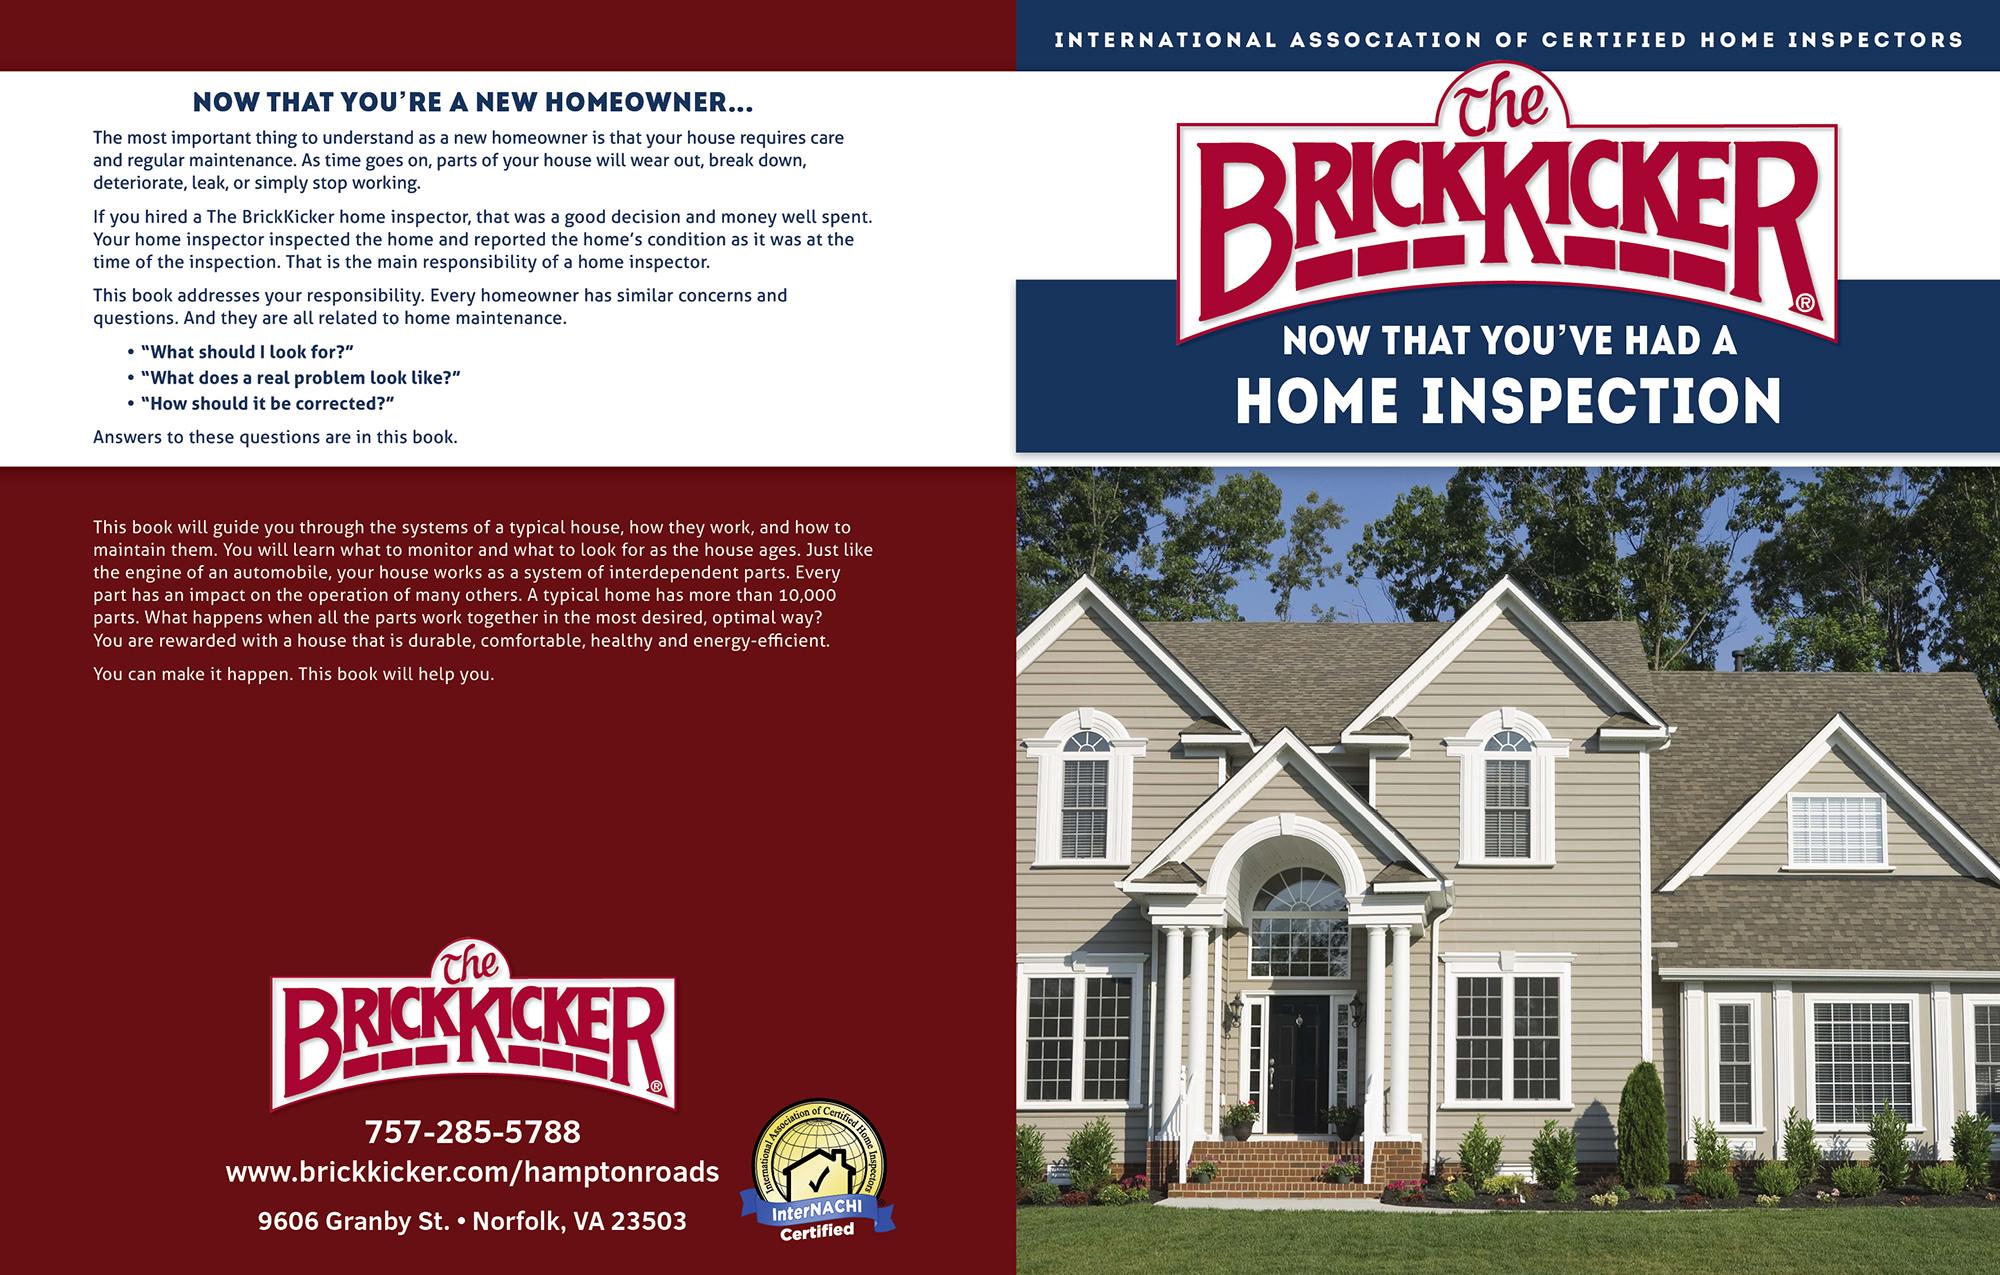 custom home maintenance book for brickkicker - inspection gallery